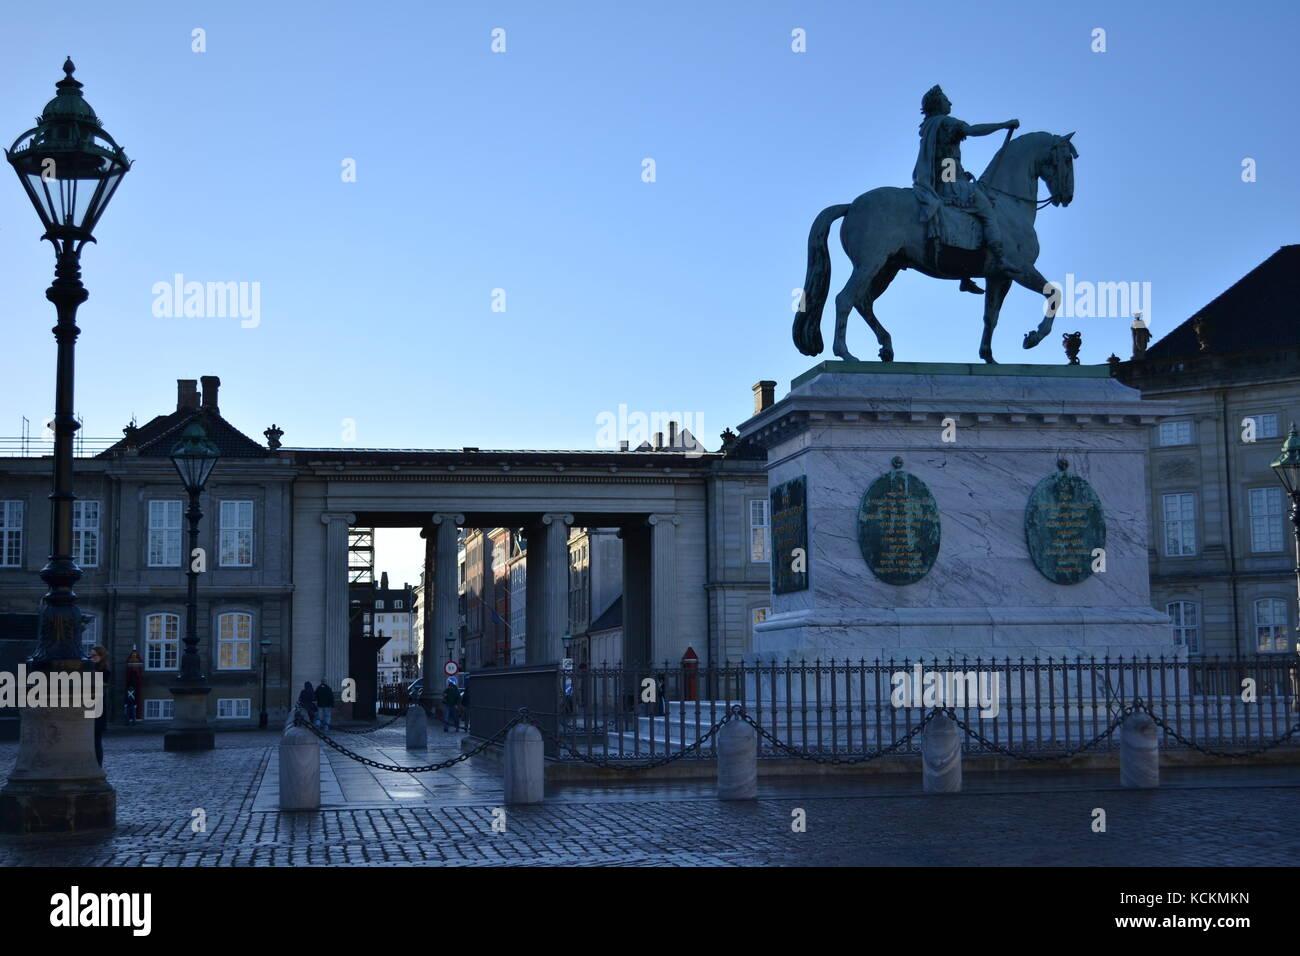 Palácio de Amalienborg - Copenhagem Immagini Stock